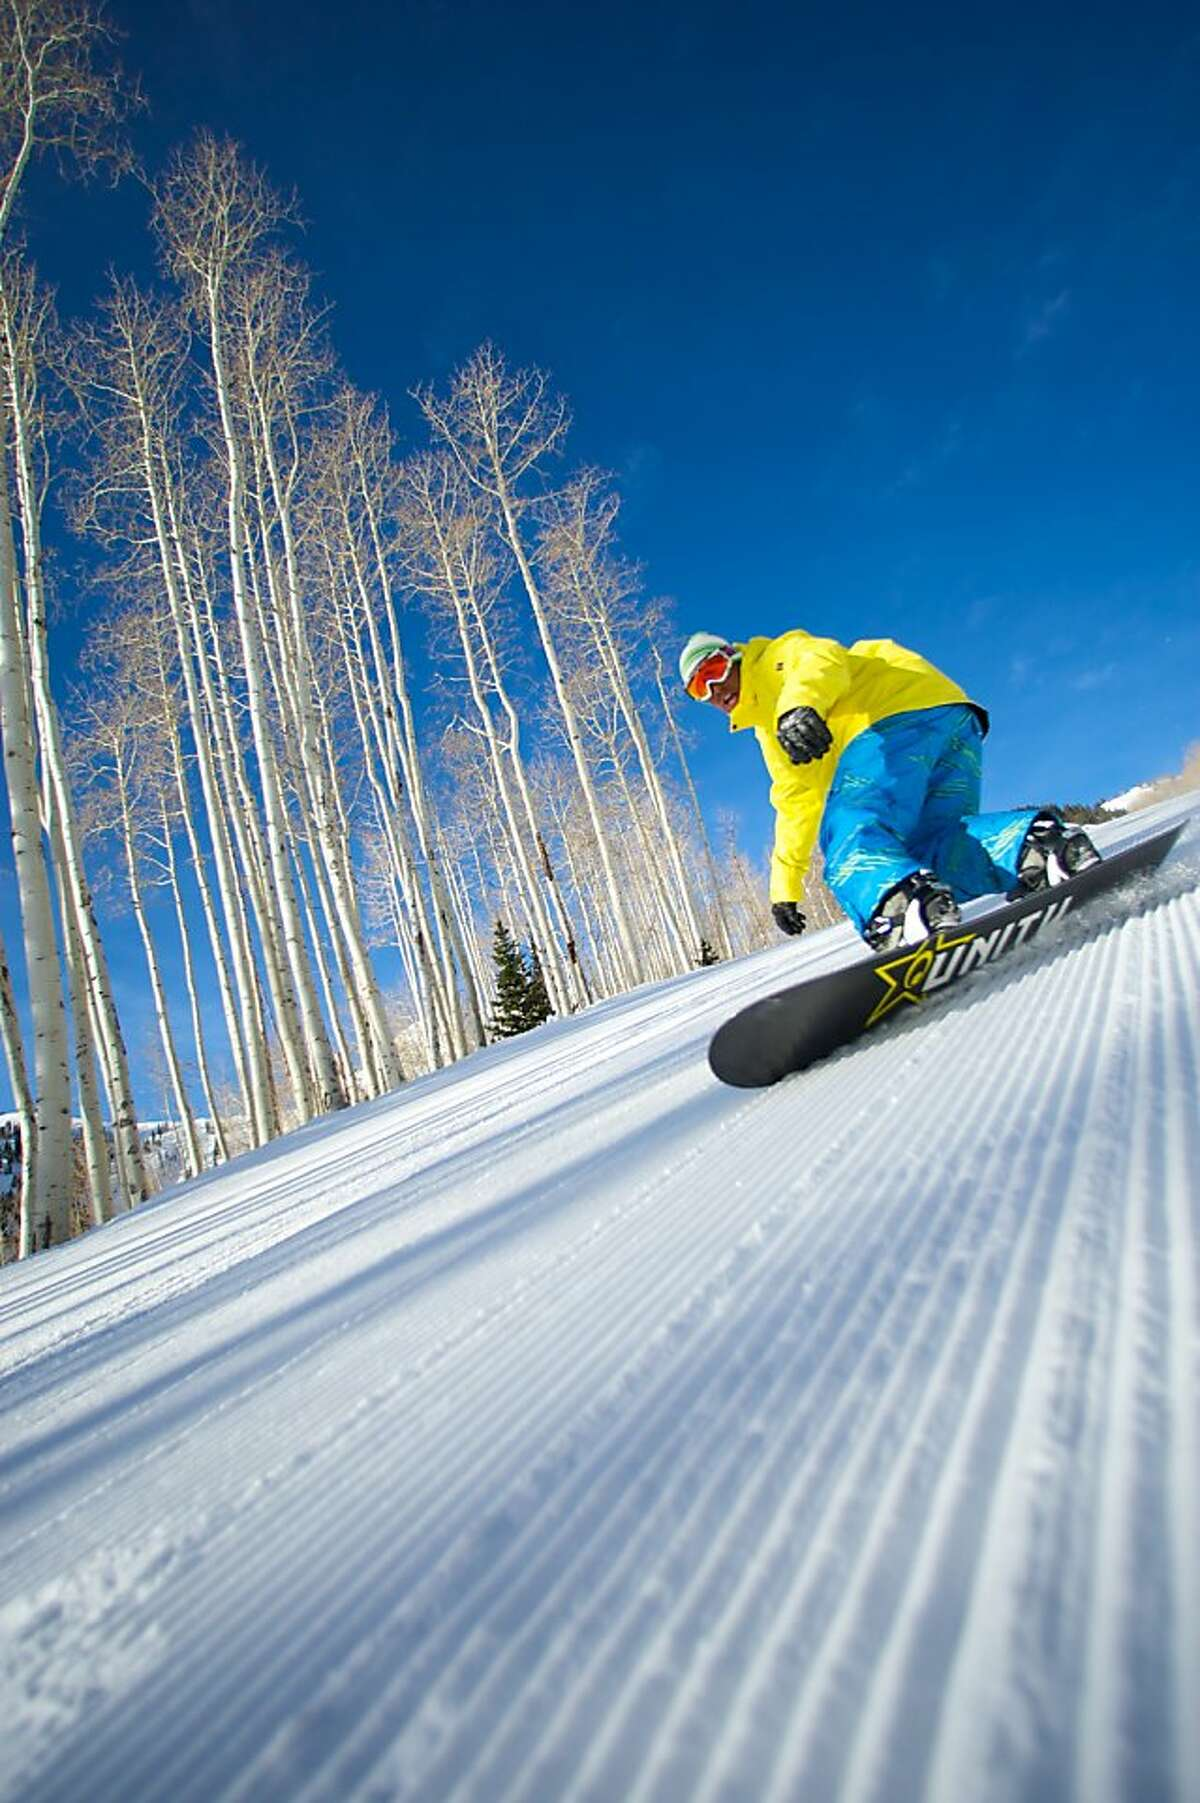 Snowboarding at Canyons Resort, Utah.